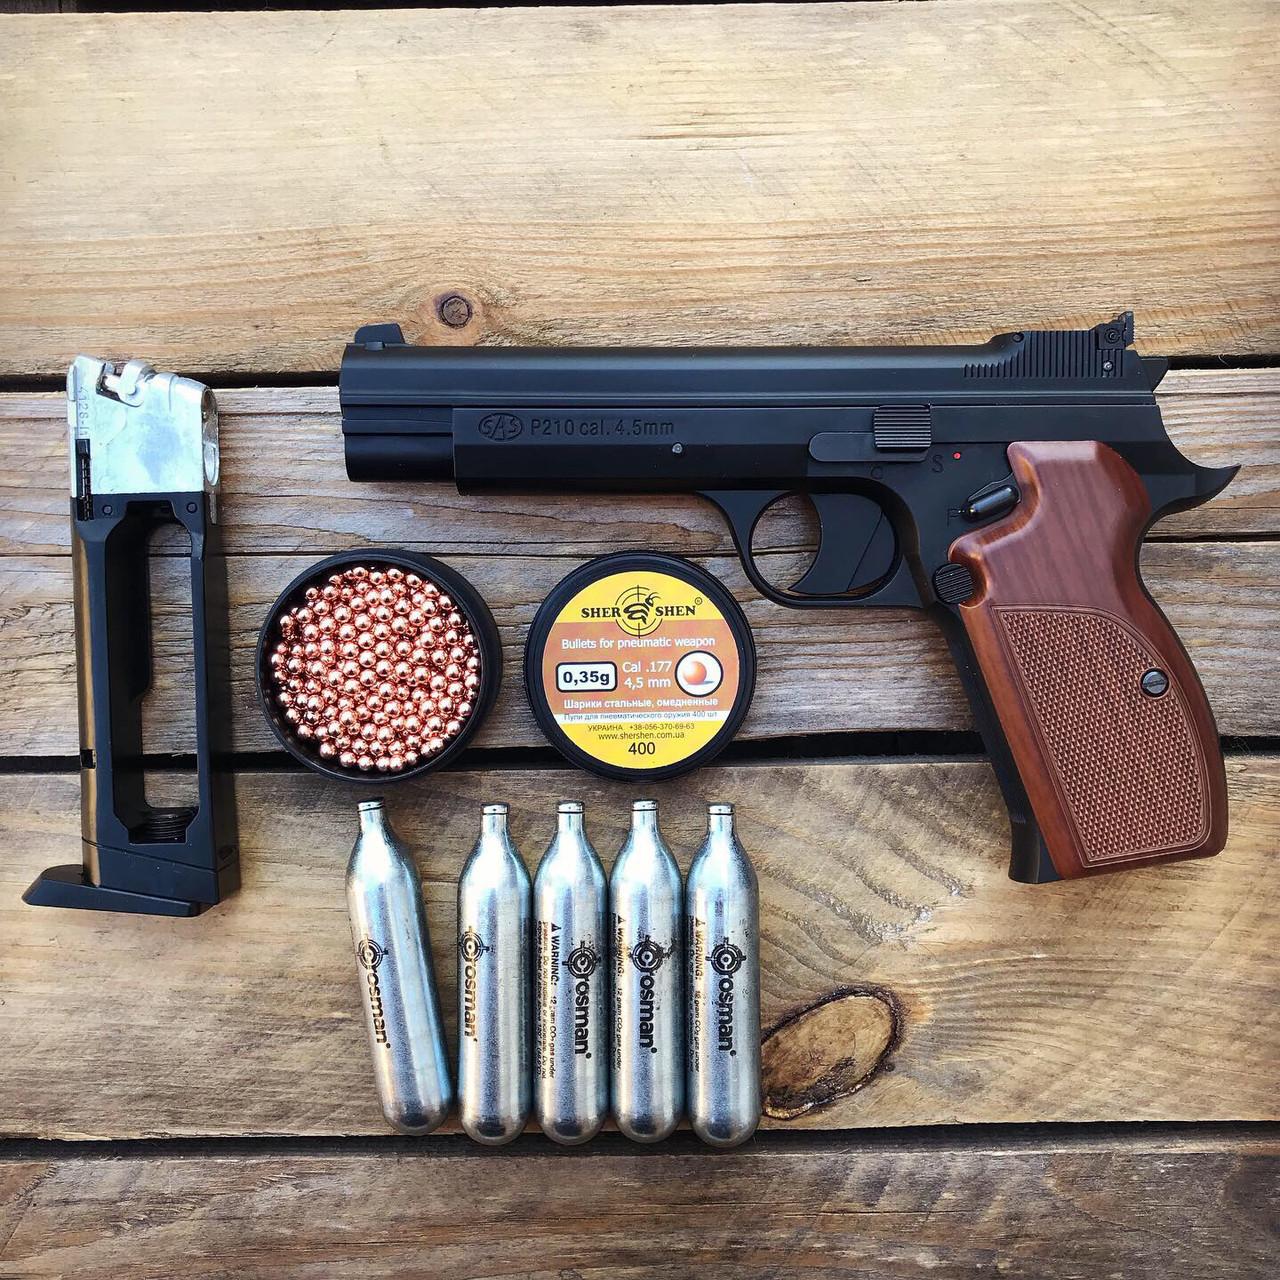 Набор пистолет пневматический SAS P 210 Blowback + баллоны + шарики BB (металл)